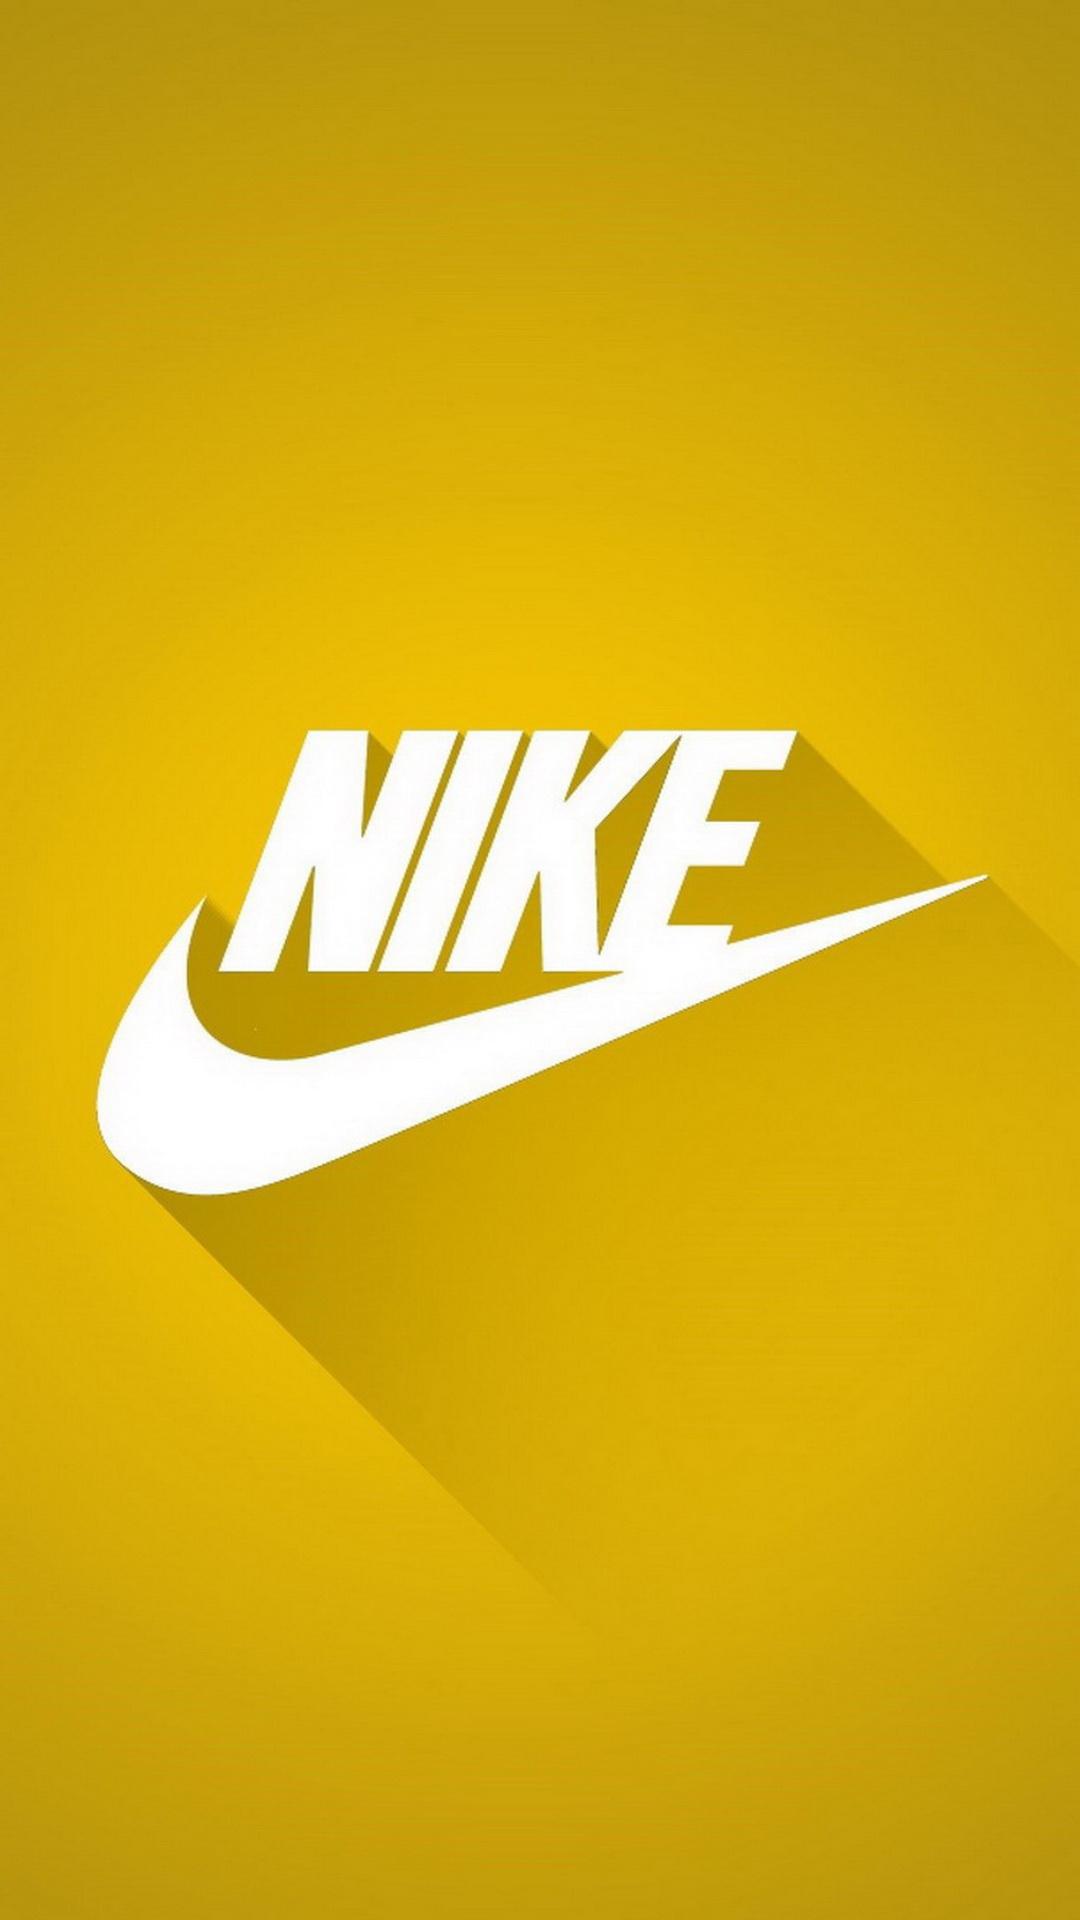 Fond D écrans Galaxy Nike 02 1080x1920 Lg Motorola Huawei